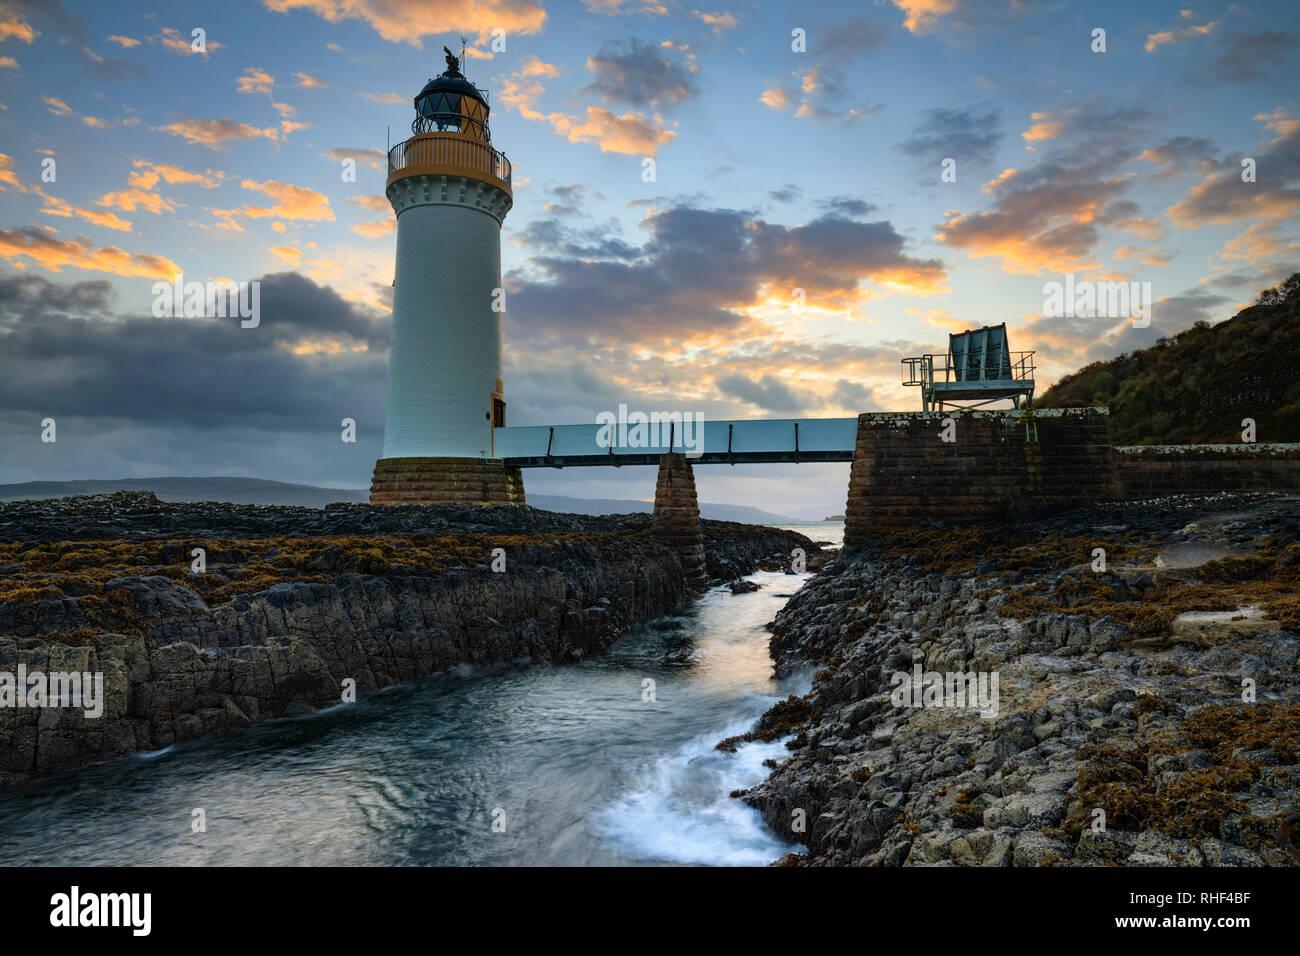 Rubha nan Gall Lighthouse on the Isle of Mull captured at sunrise. - Stock Image